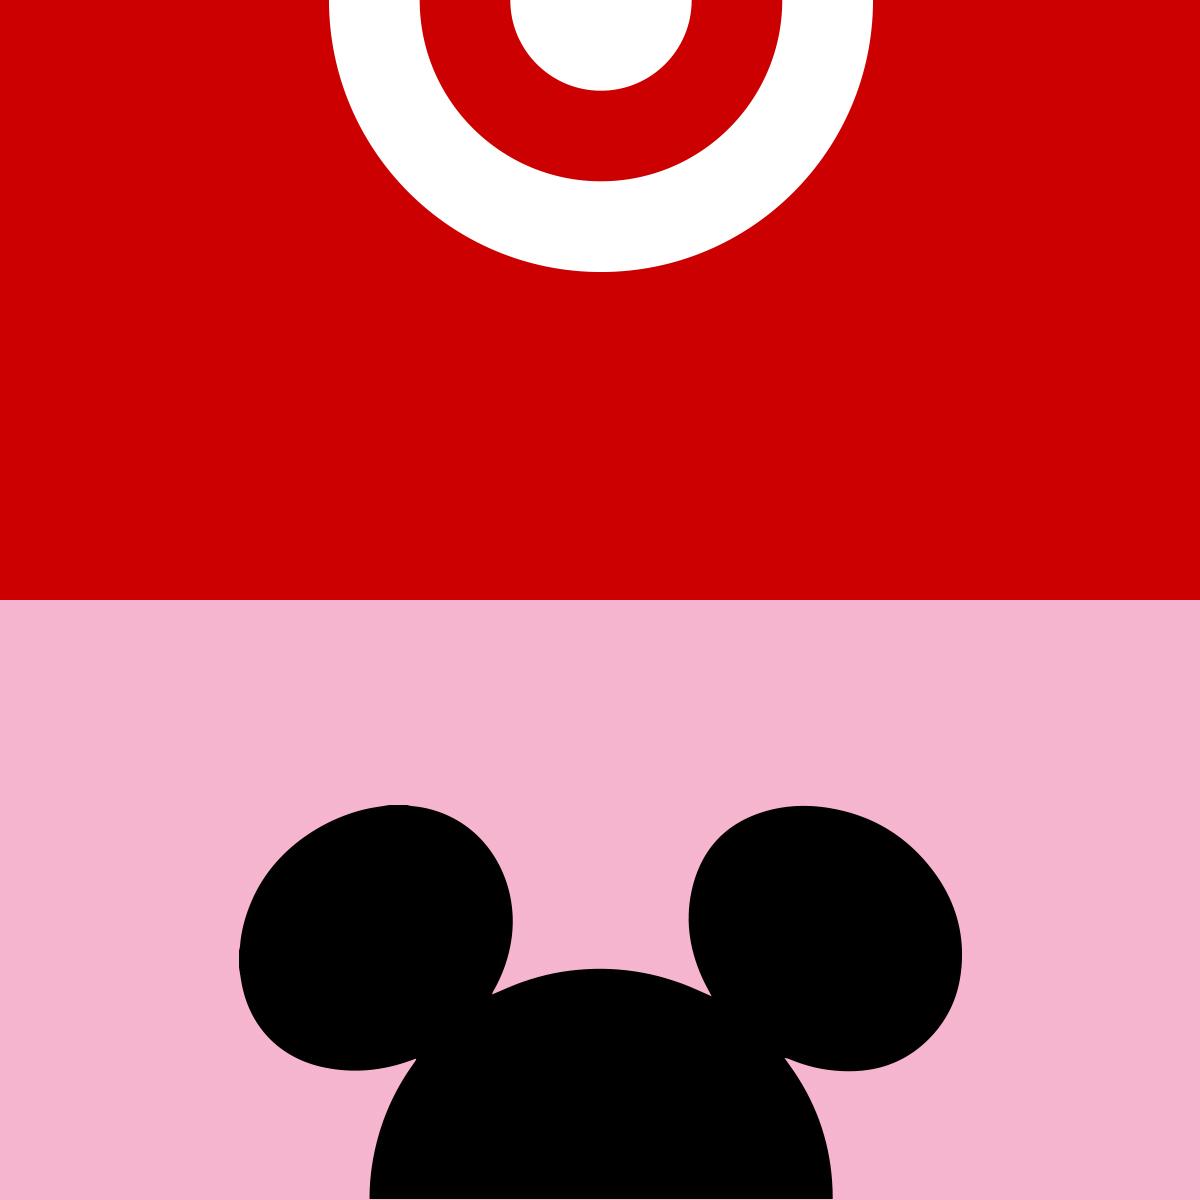 TargetMickey_ApparelCarousel_LogoLockup.jpg